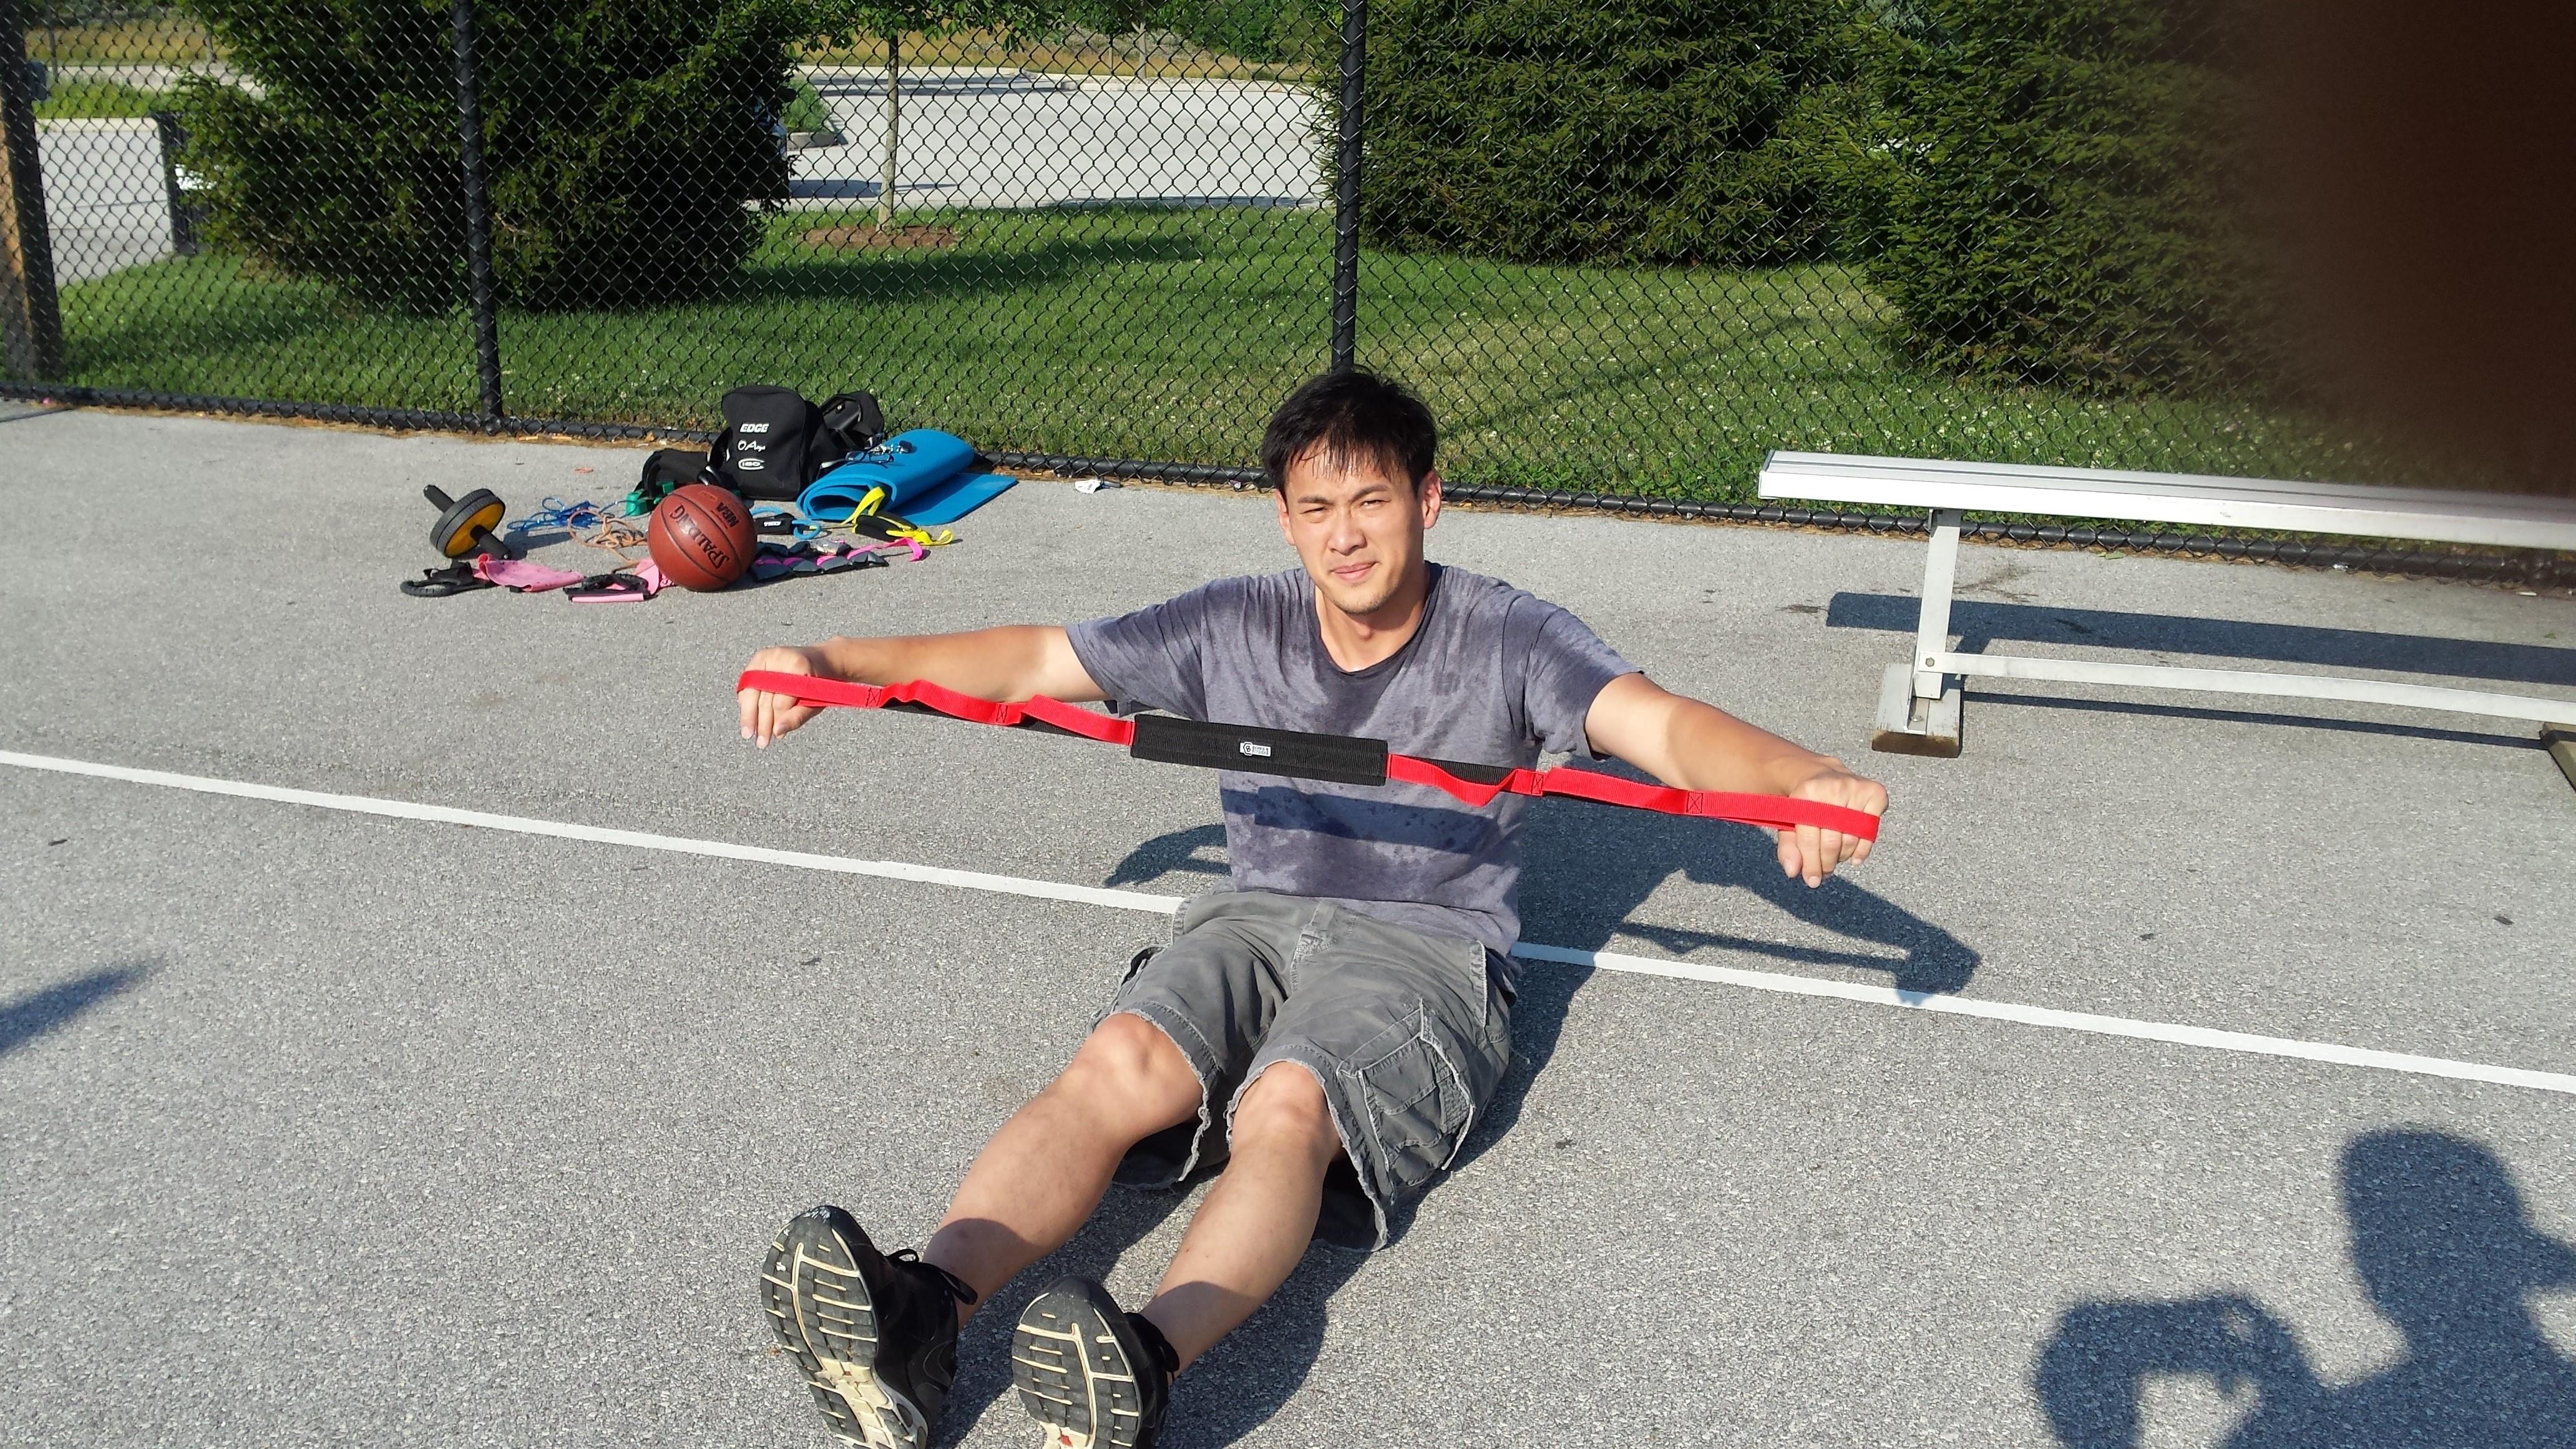 Fitness Traing